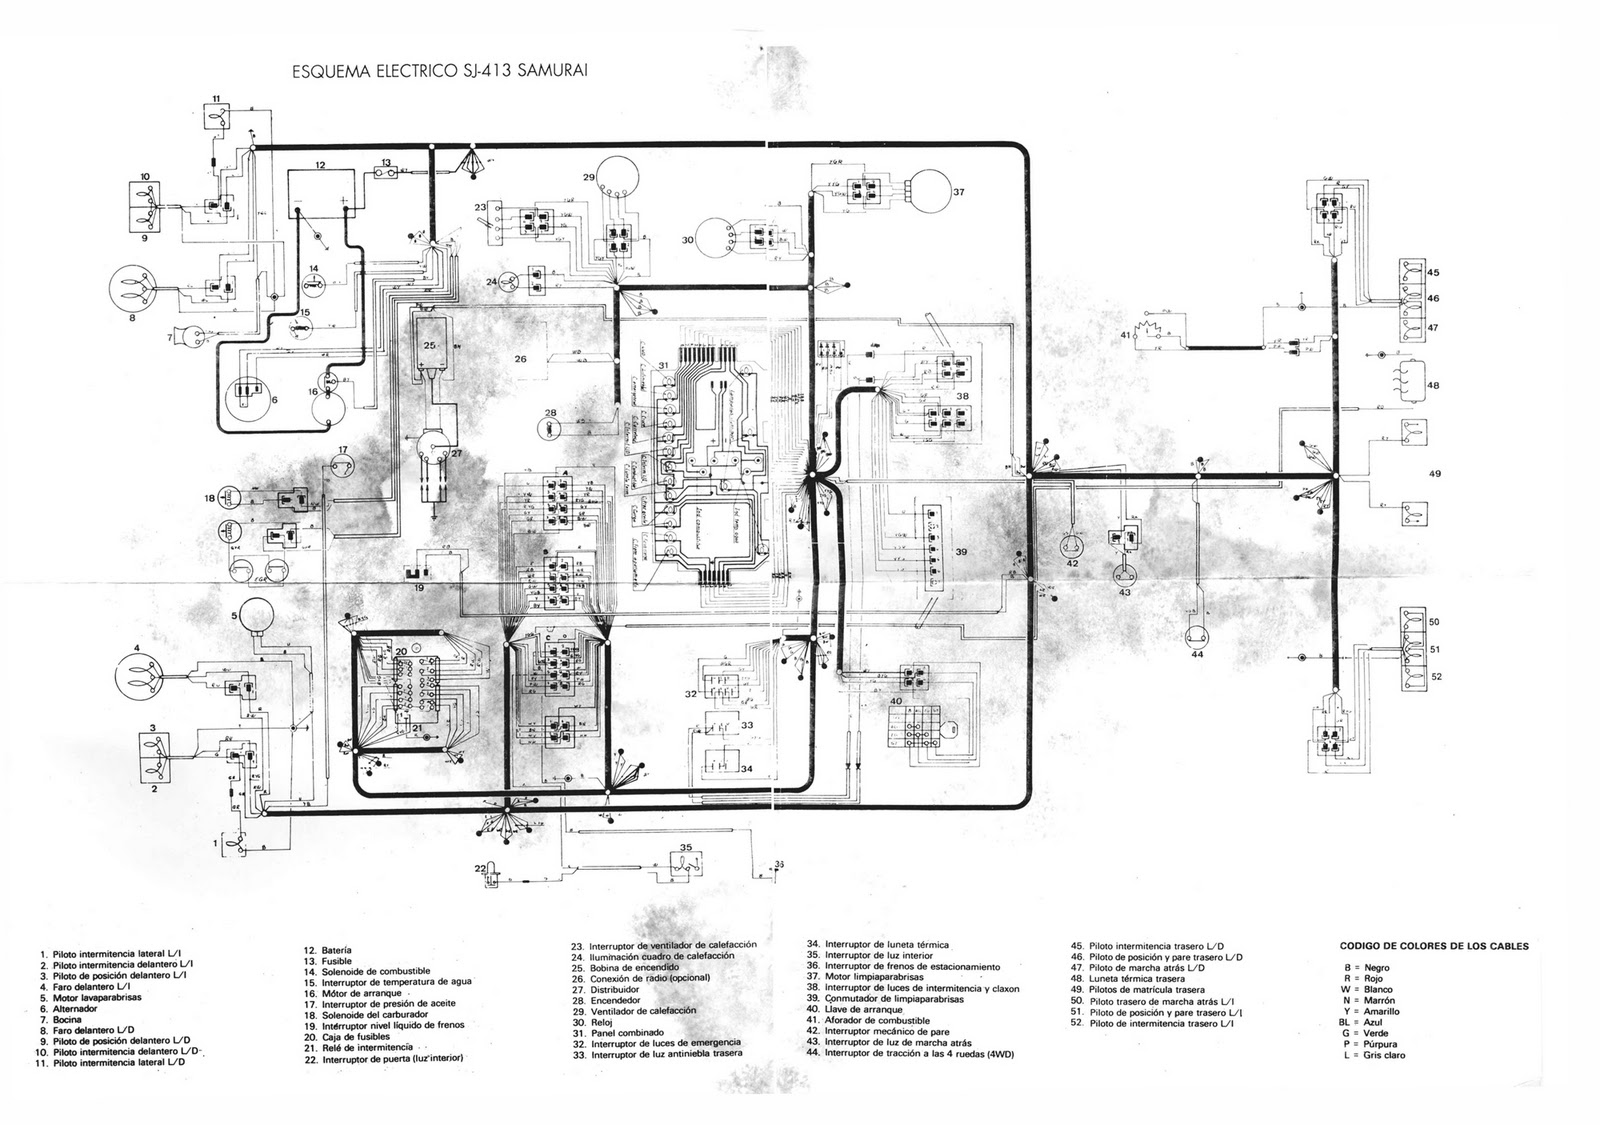 Funky 1998 Suzuki Sidekick Wiring Diagrams Festooning Electrical